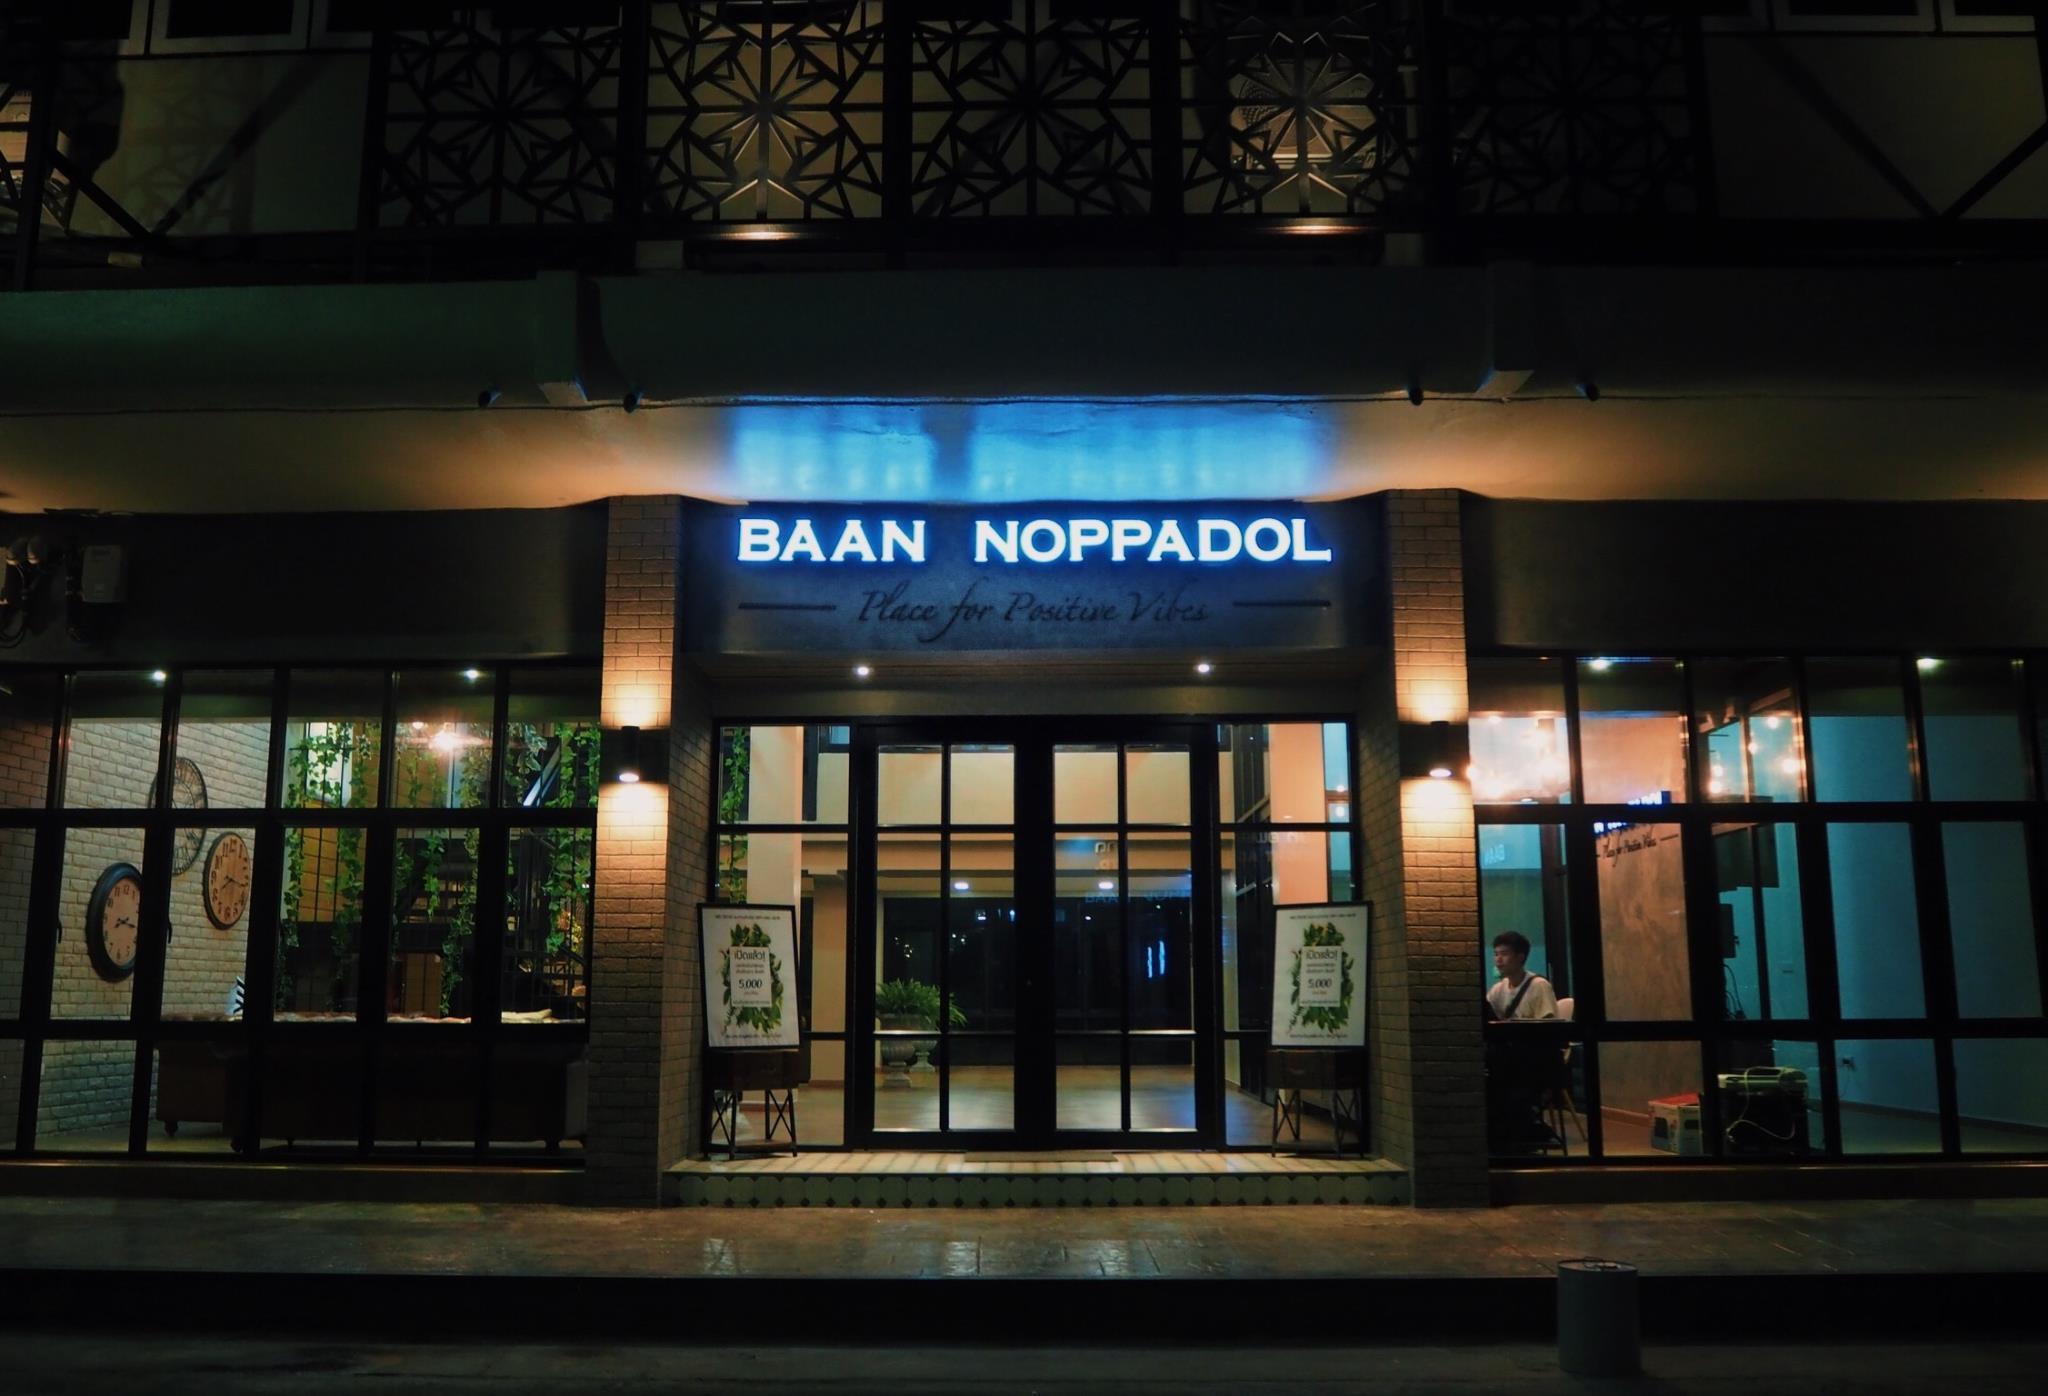 Baan Noppadol Hotel & Apartment,บ้านนพดล โฮเทล แอนด์ อพาร์ตเมนต์